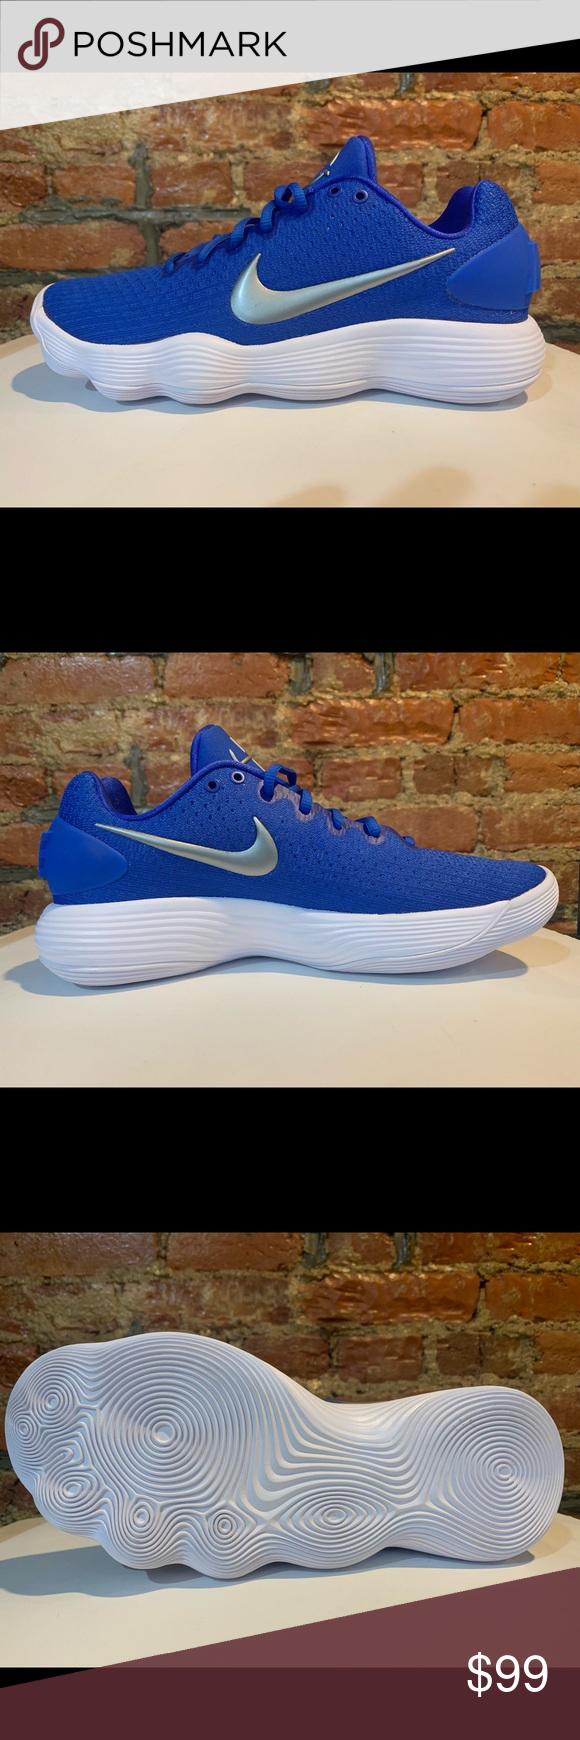 04e5608a8f35 NEW Nike Hyperdunk Low TB Basketball Shoes Brand new pair of Men s Nike  Hyperdunk Low TB